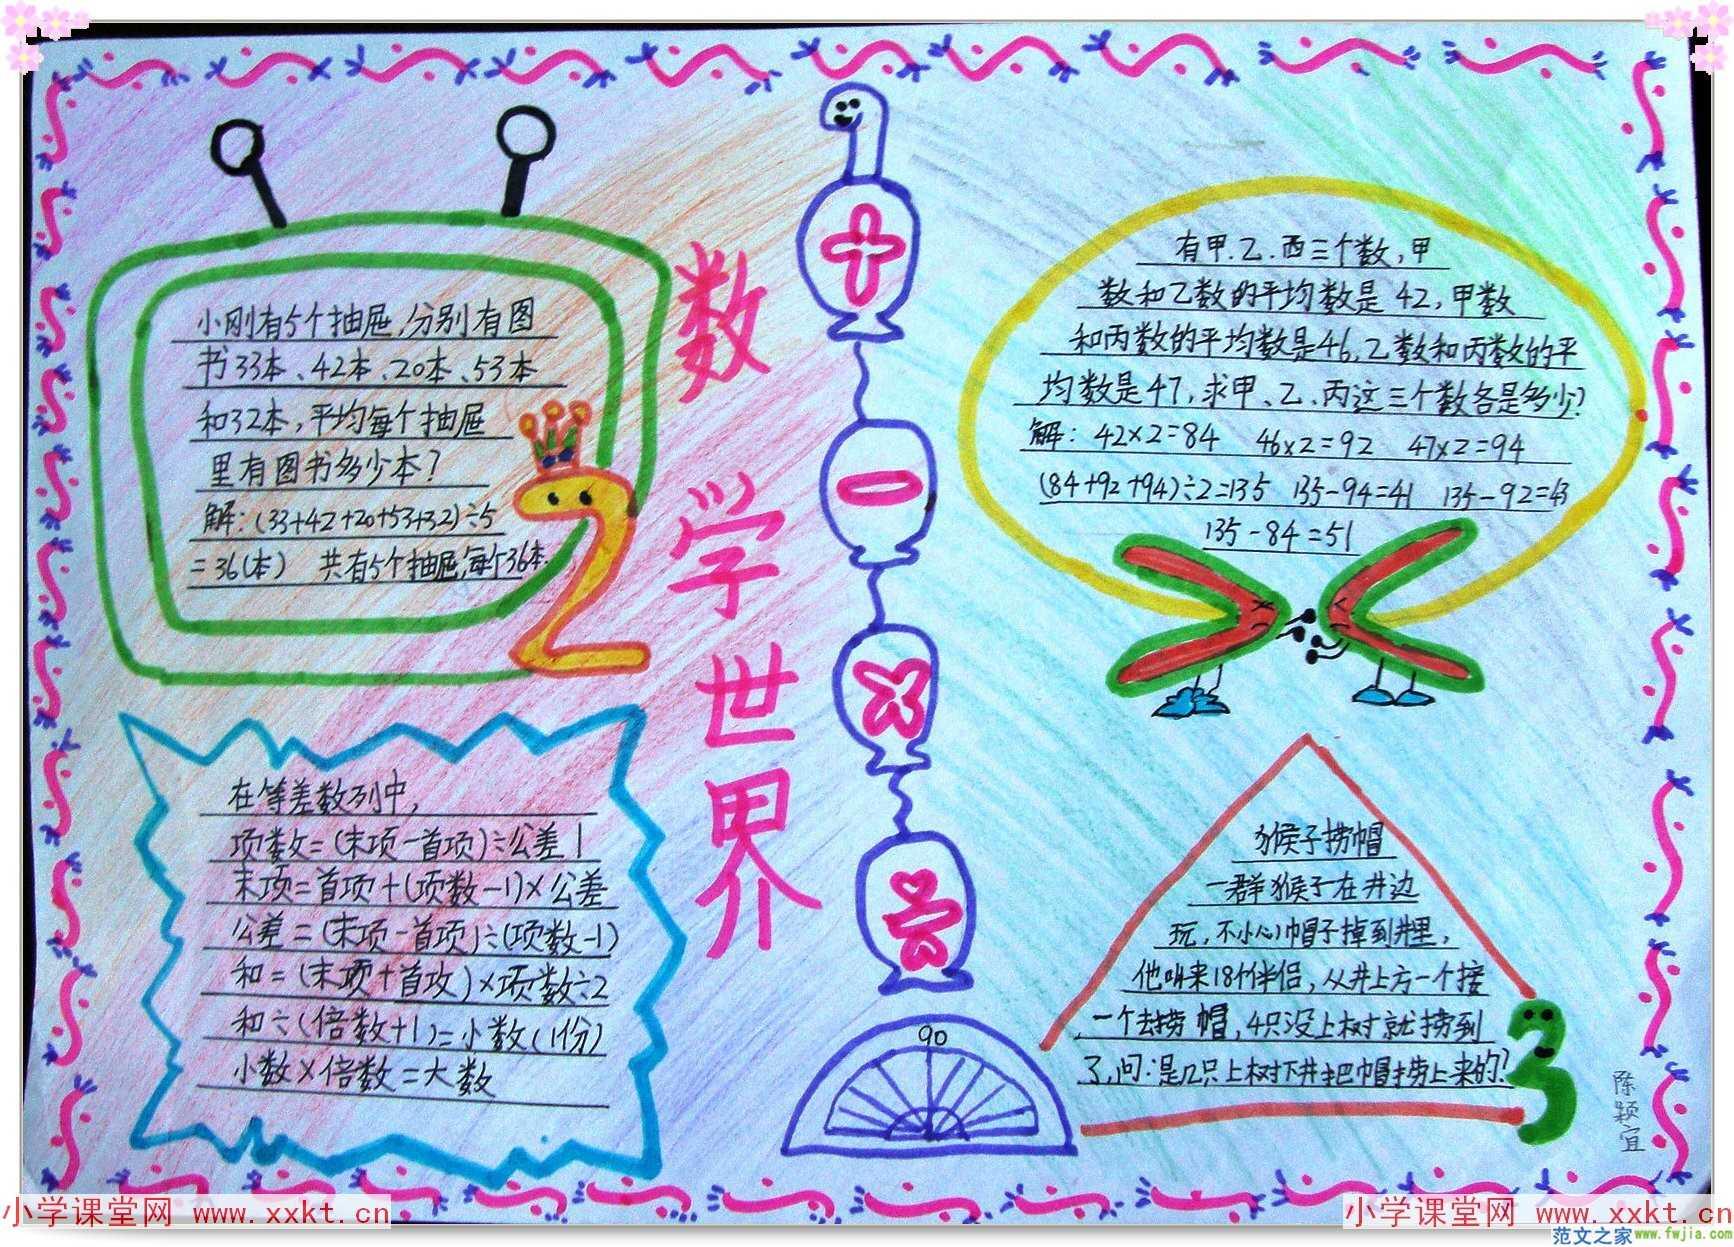 design 数学手抄报图片二年级 数学乐园手抄报二年级二年  小学生数学